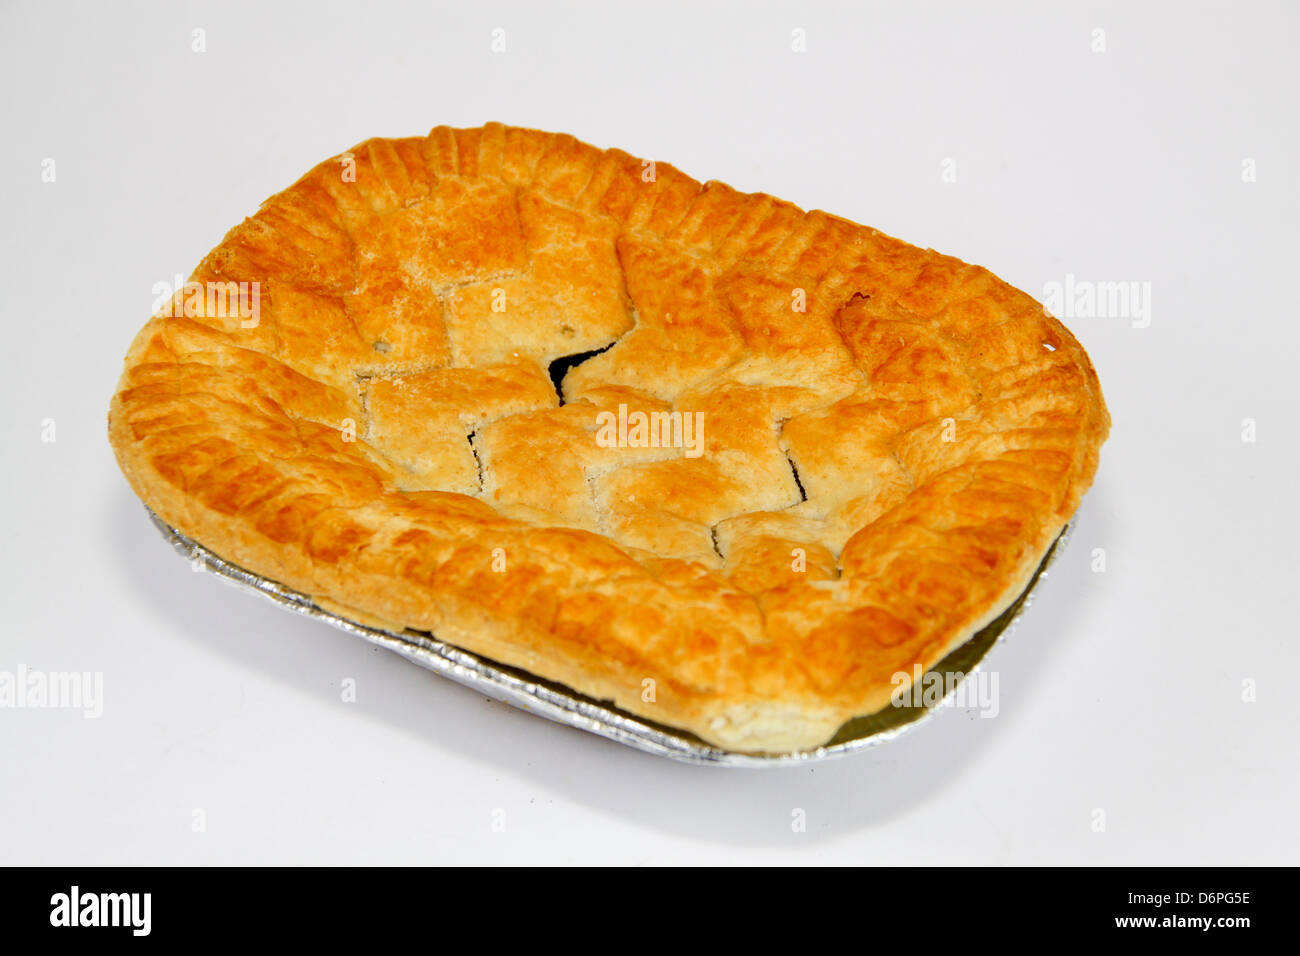 Uncooked shop bought steak pie - Stock Image